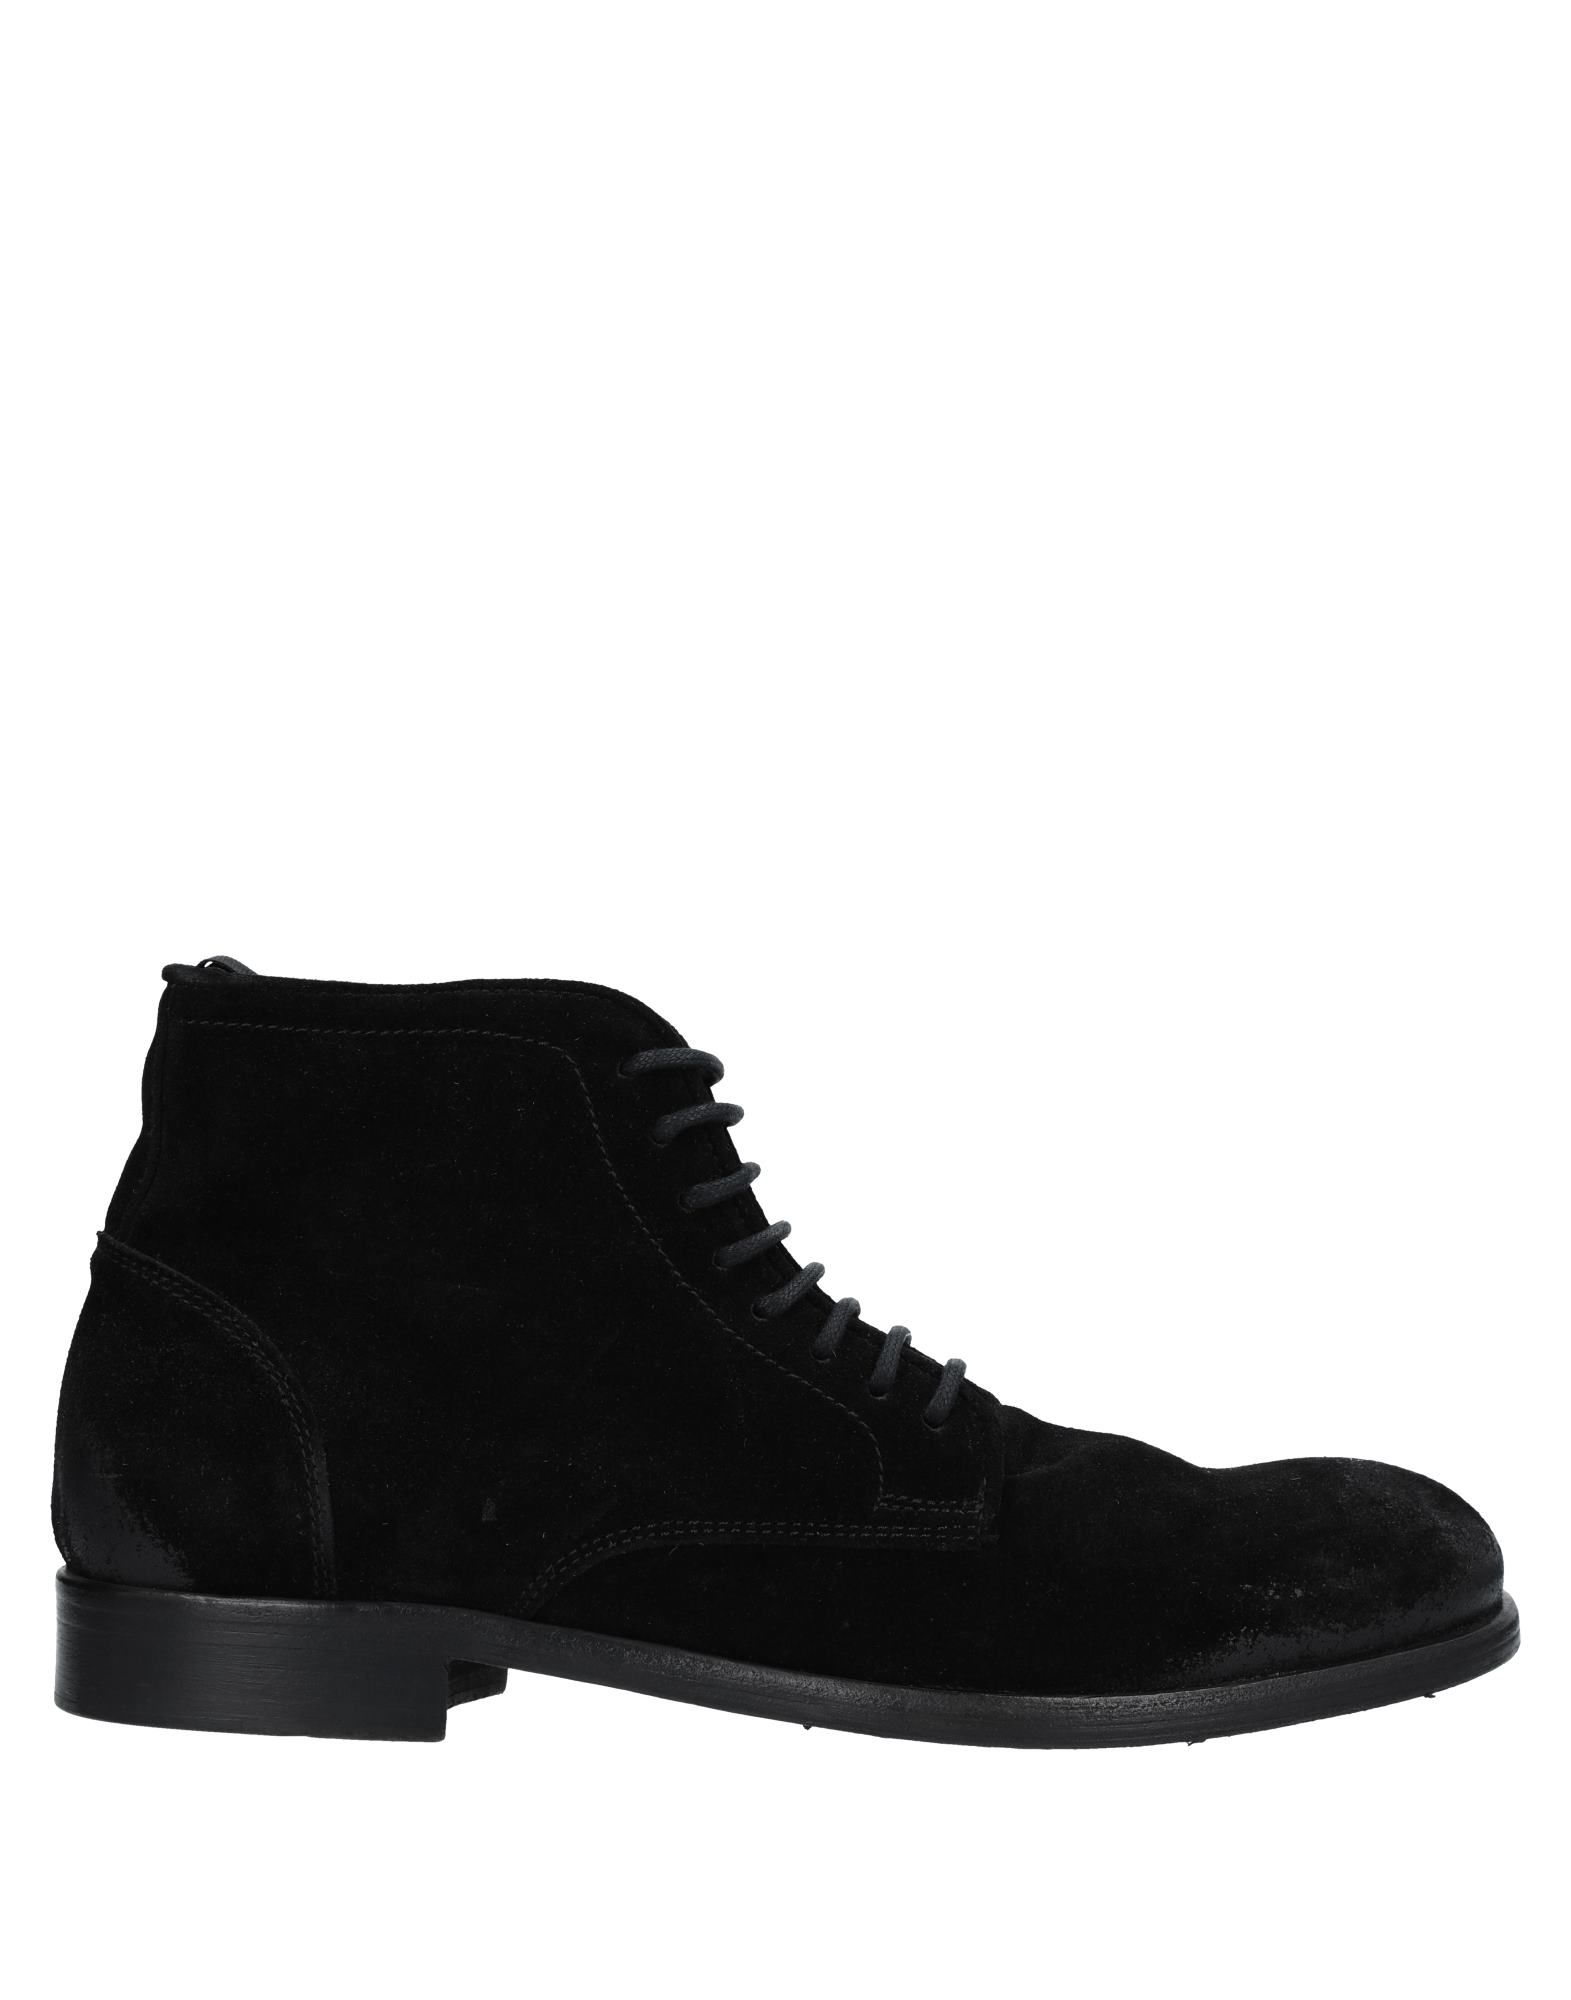 Rabatt echte Schuhe Le Qarant Stiefelette Herren  11530042OX